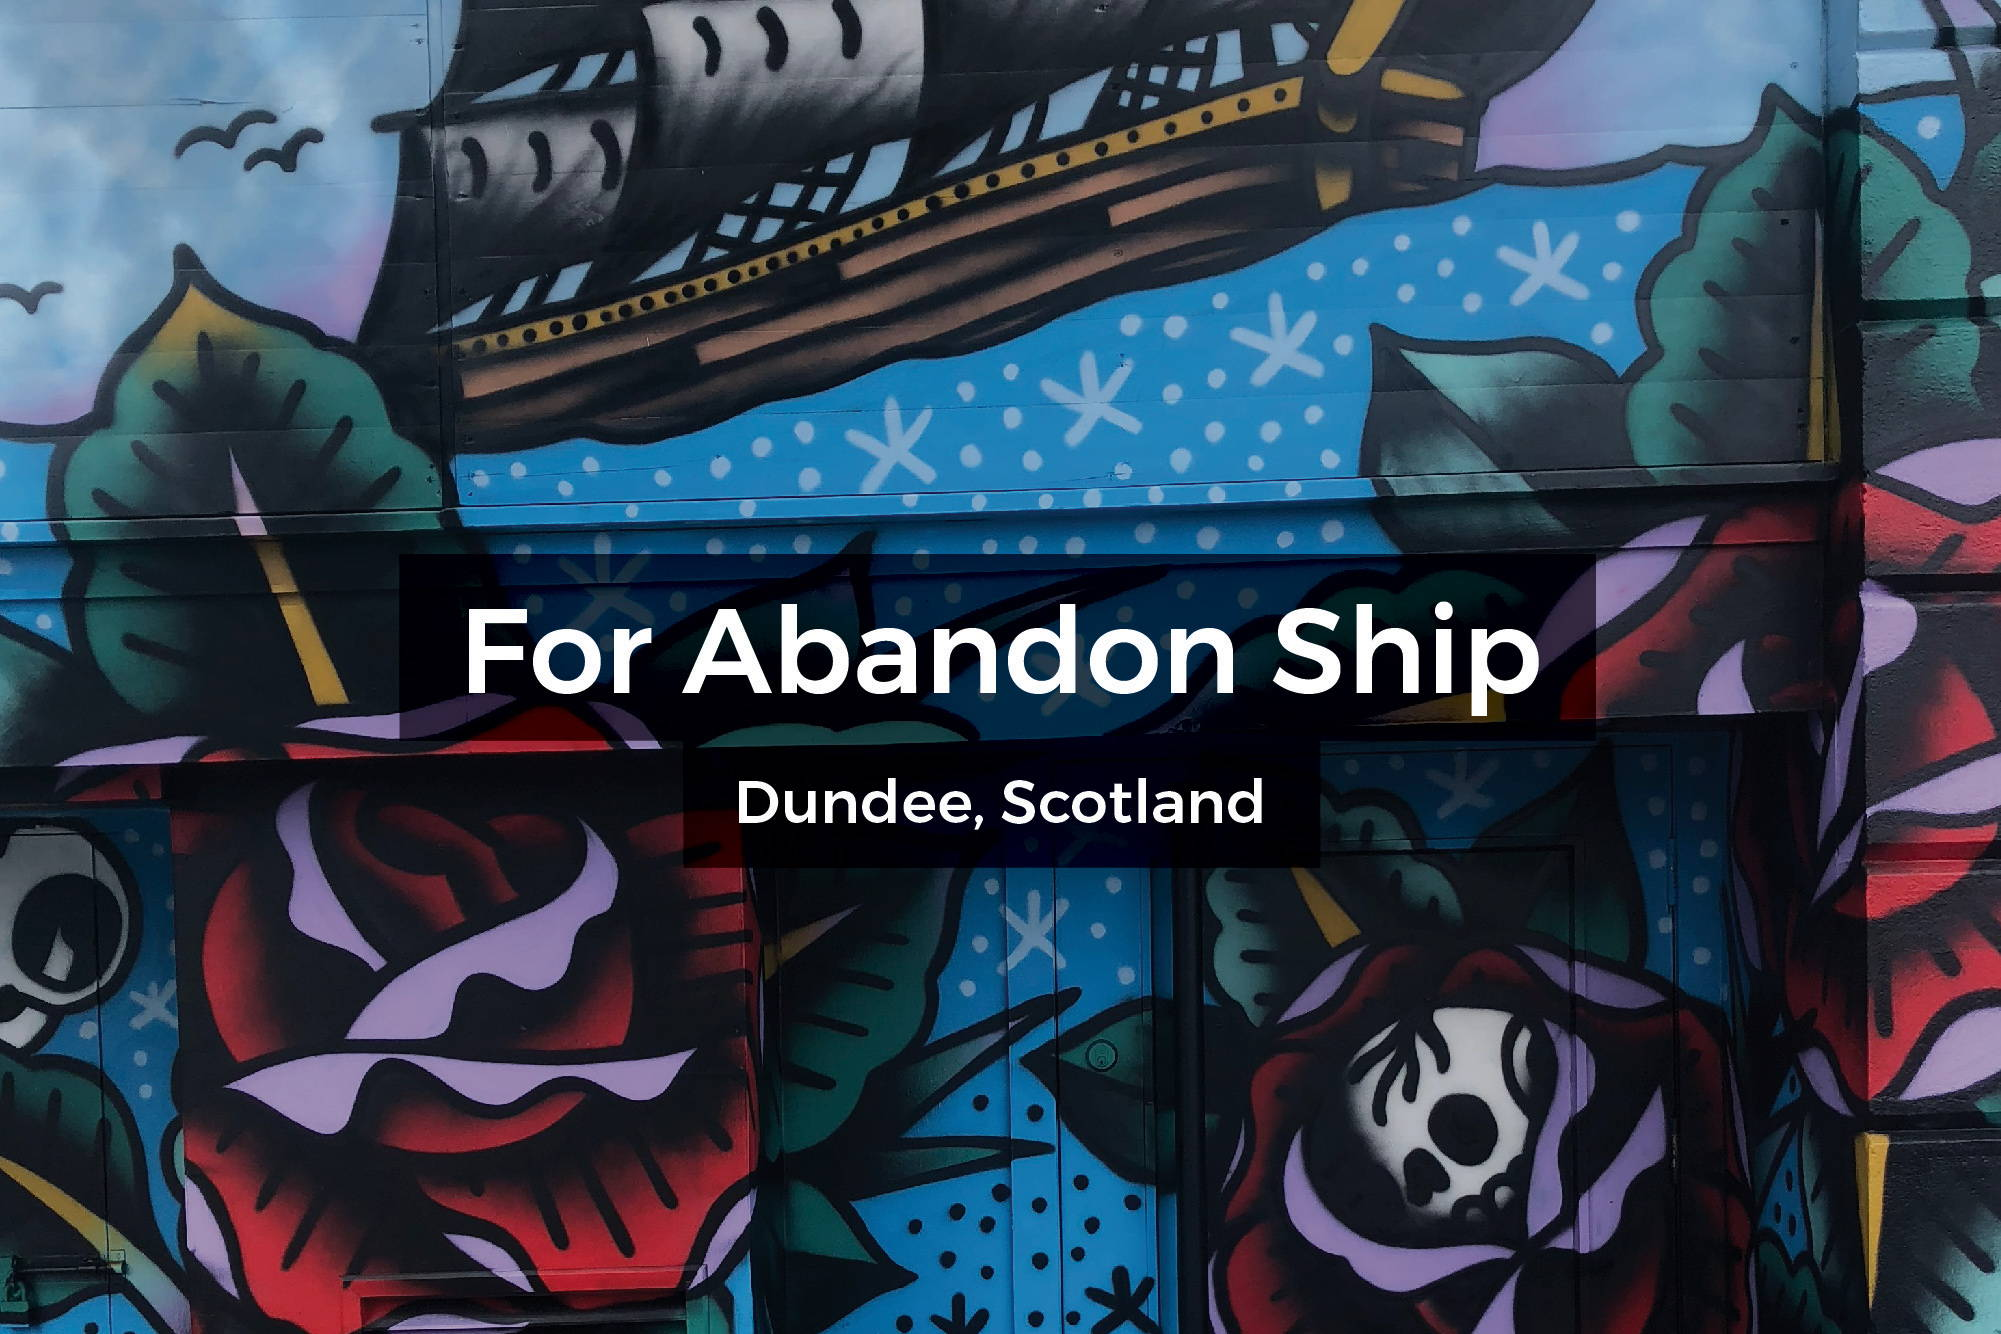 Abandon Ship Bar mural in Dundee, Scotland by Steen Jones